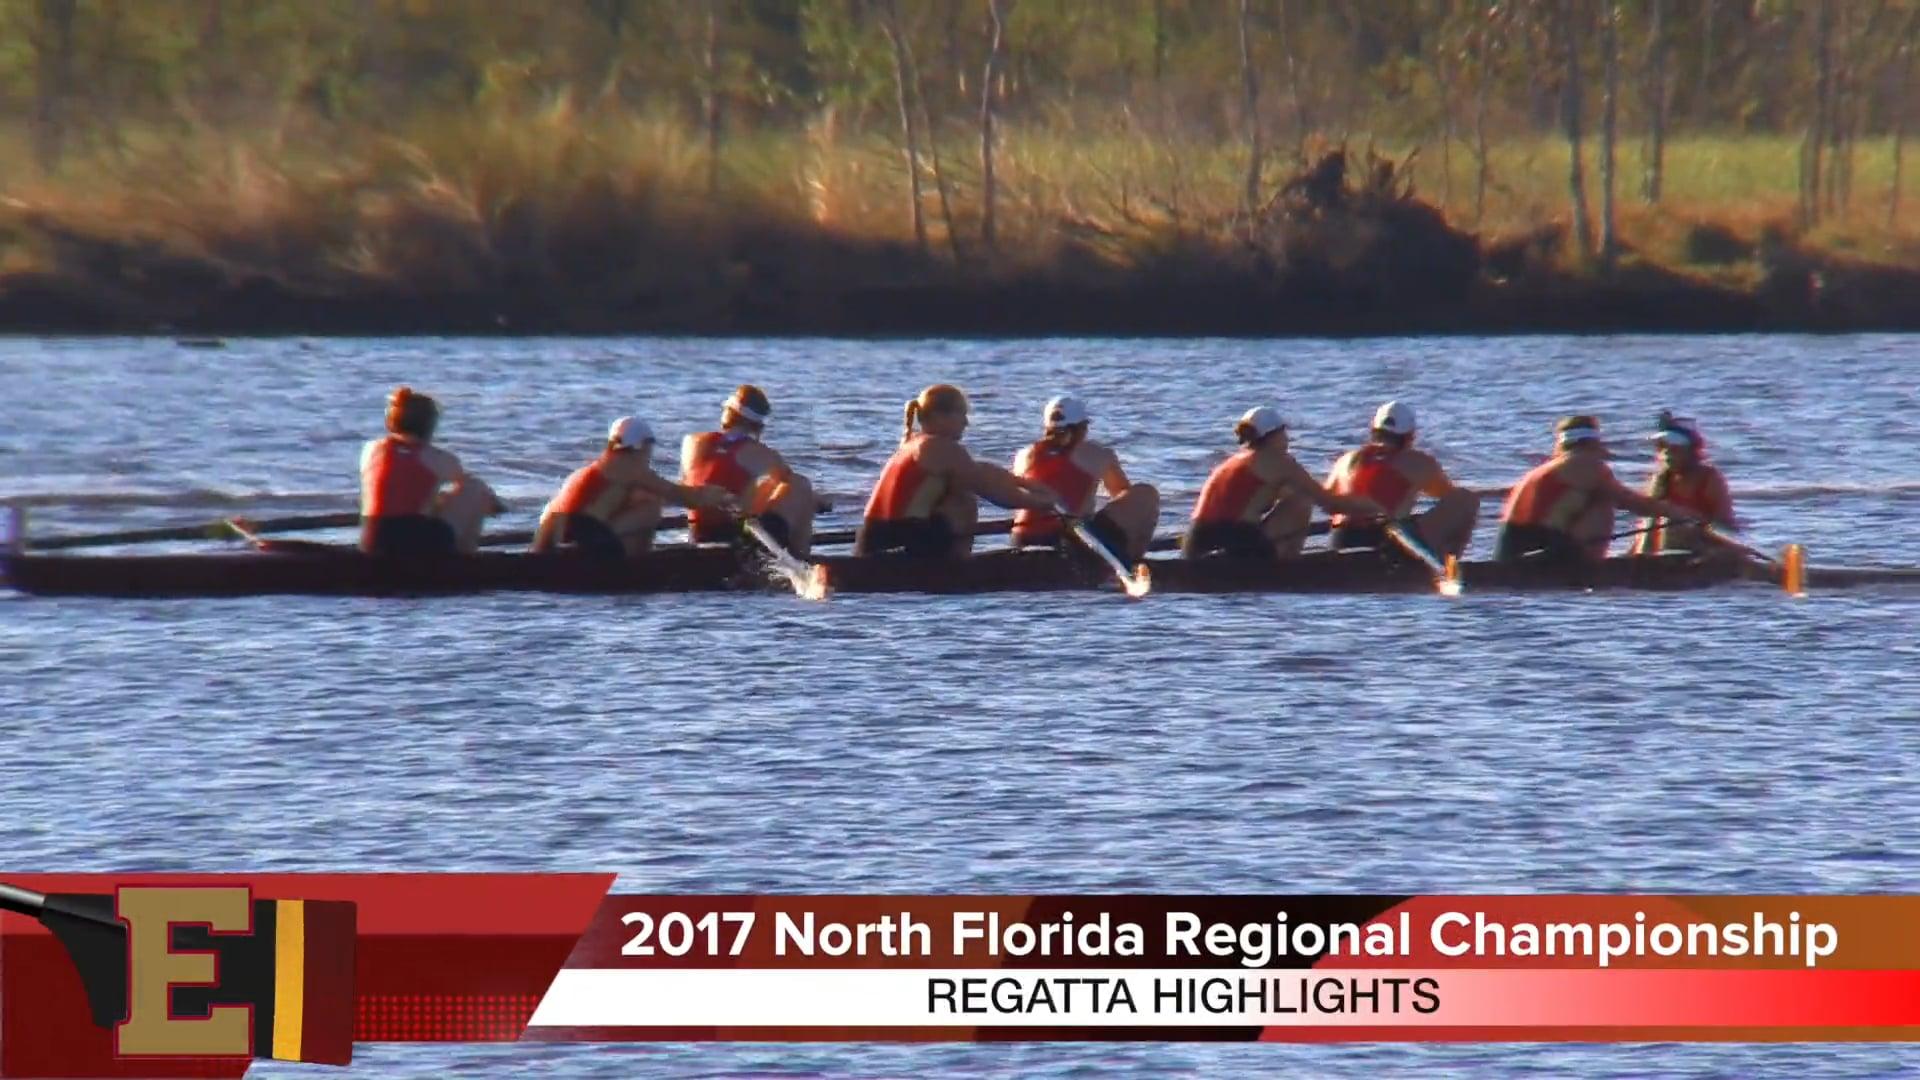 2017 FSRA North FL Championship Highlights